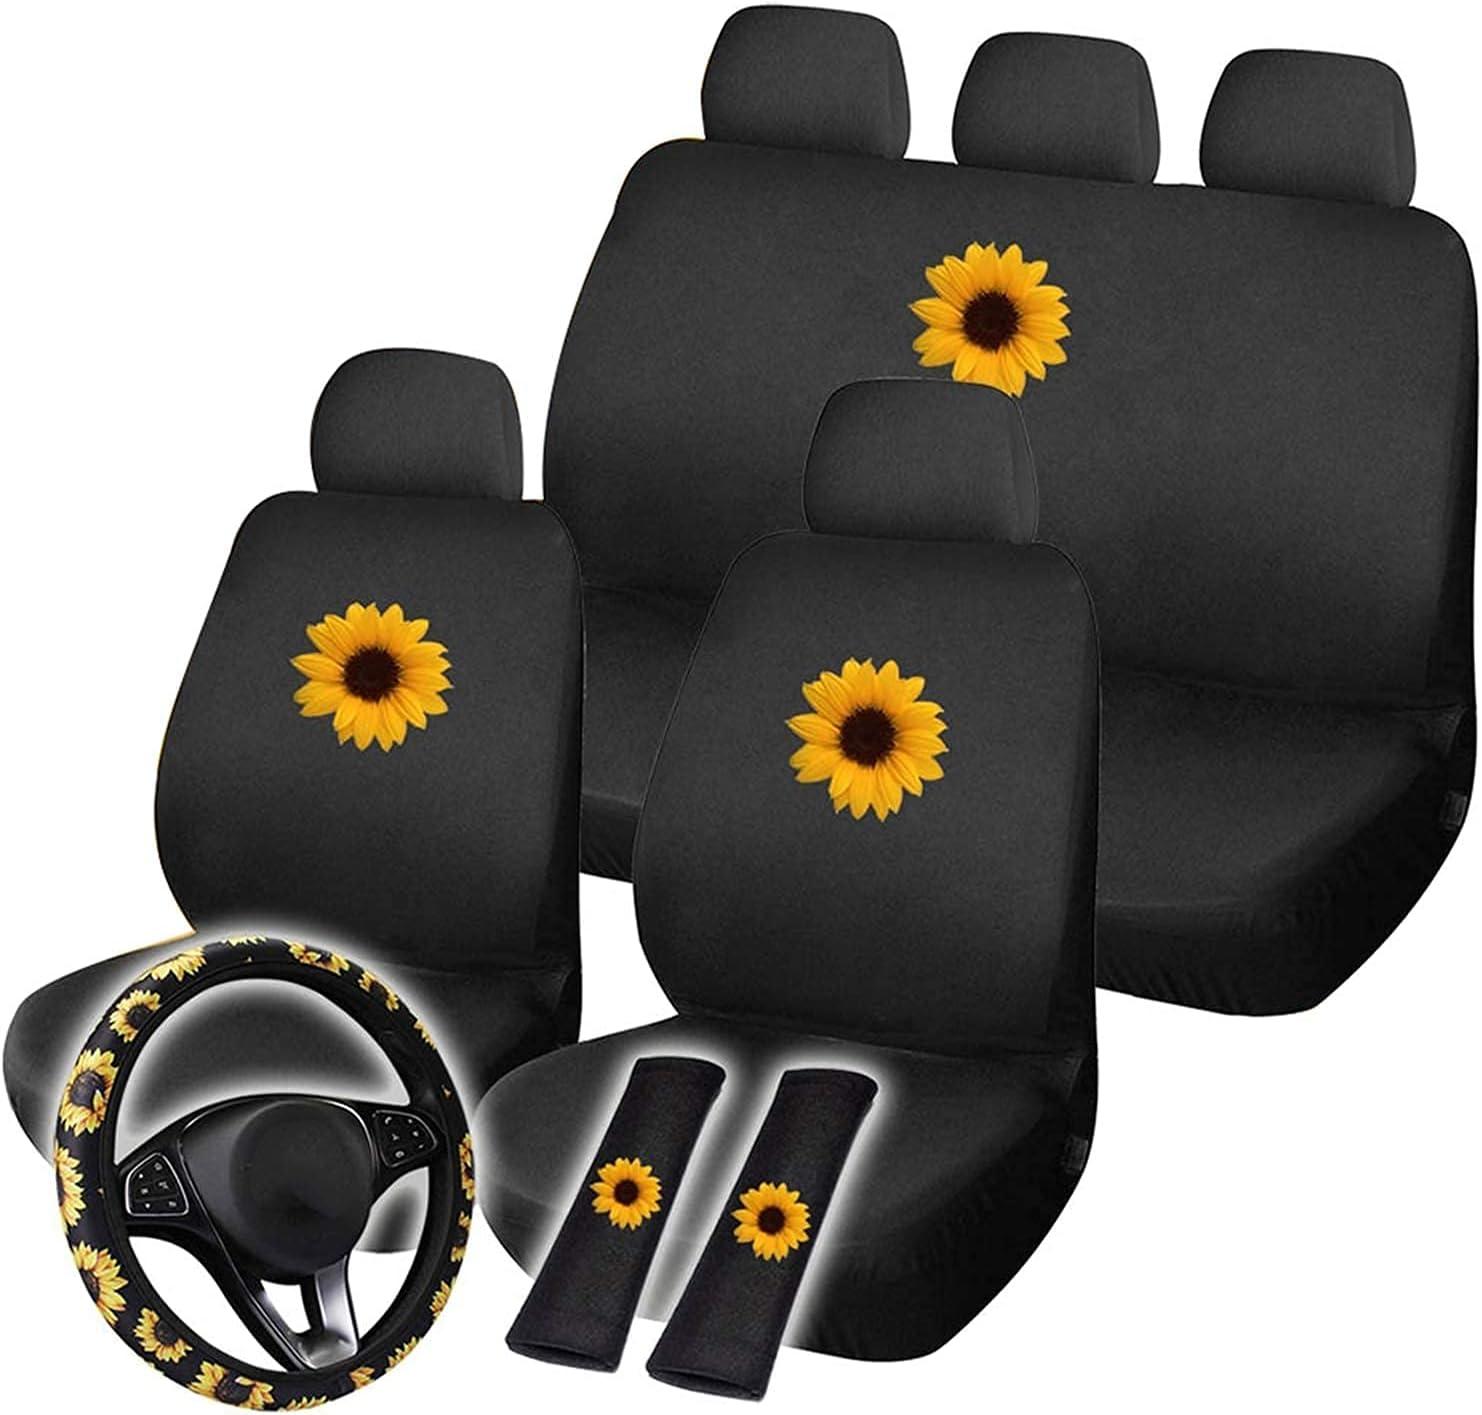 Jushom 12PCS Sunflower Car Seat Steering Wheel C Covers Set safety Luxury goods